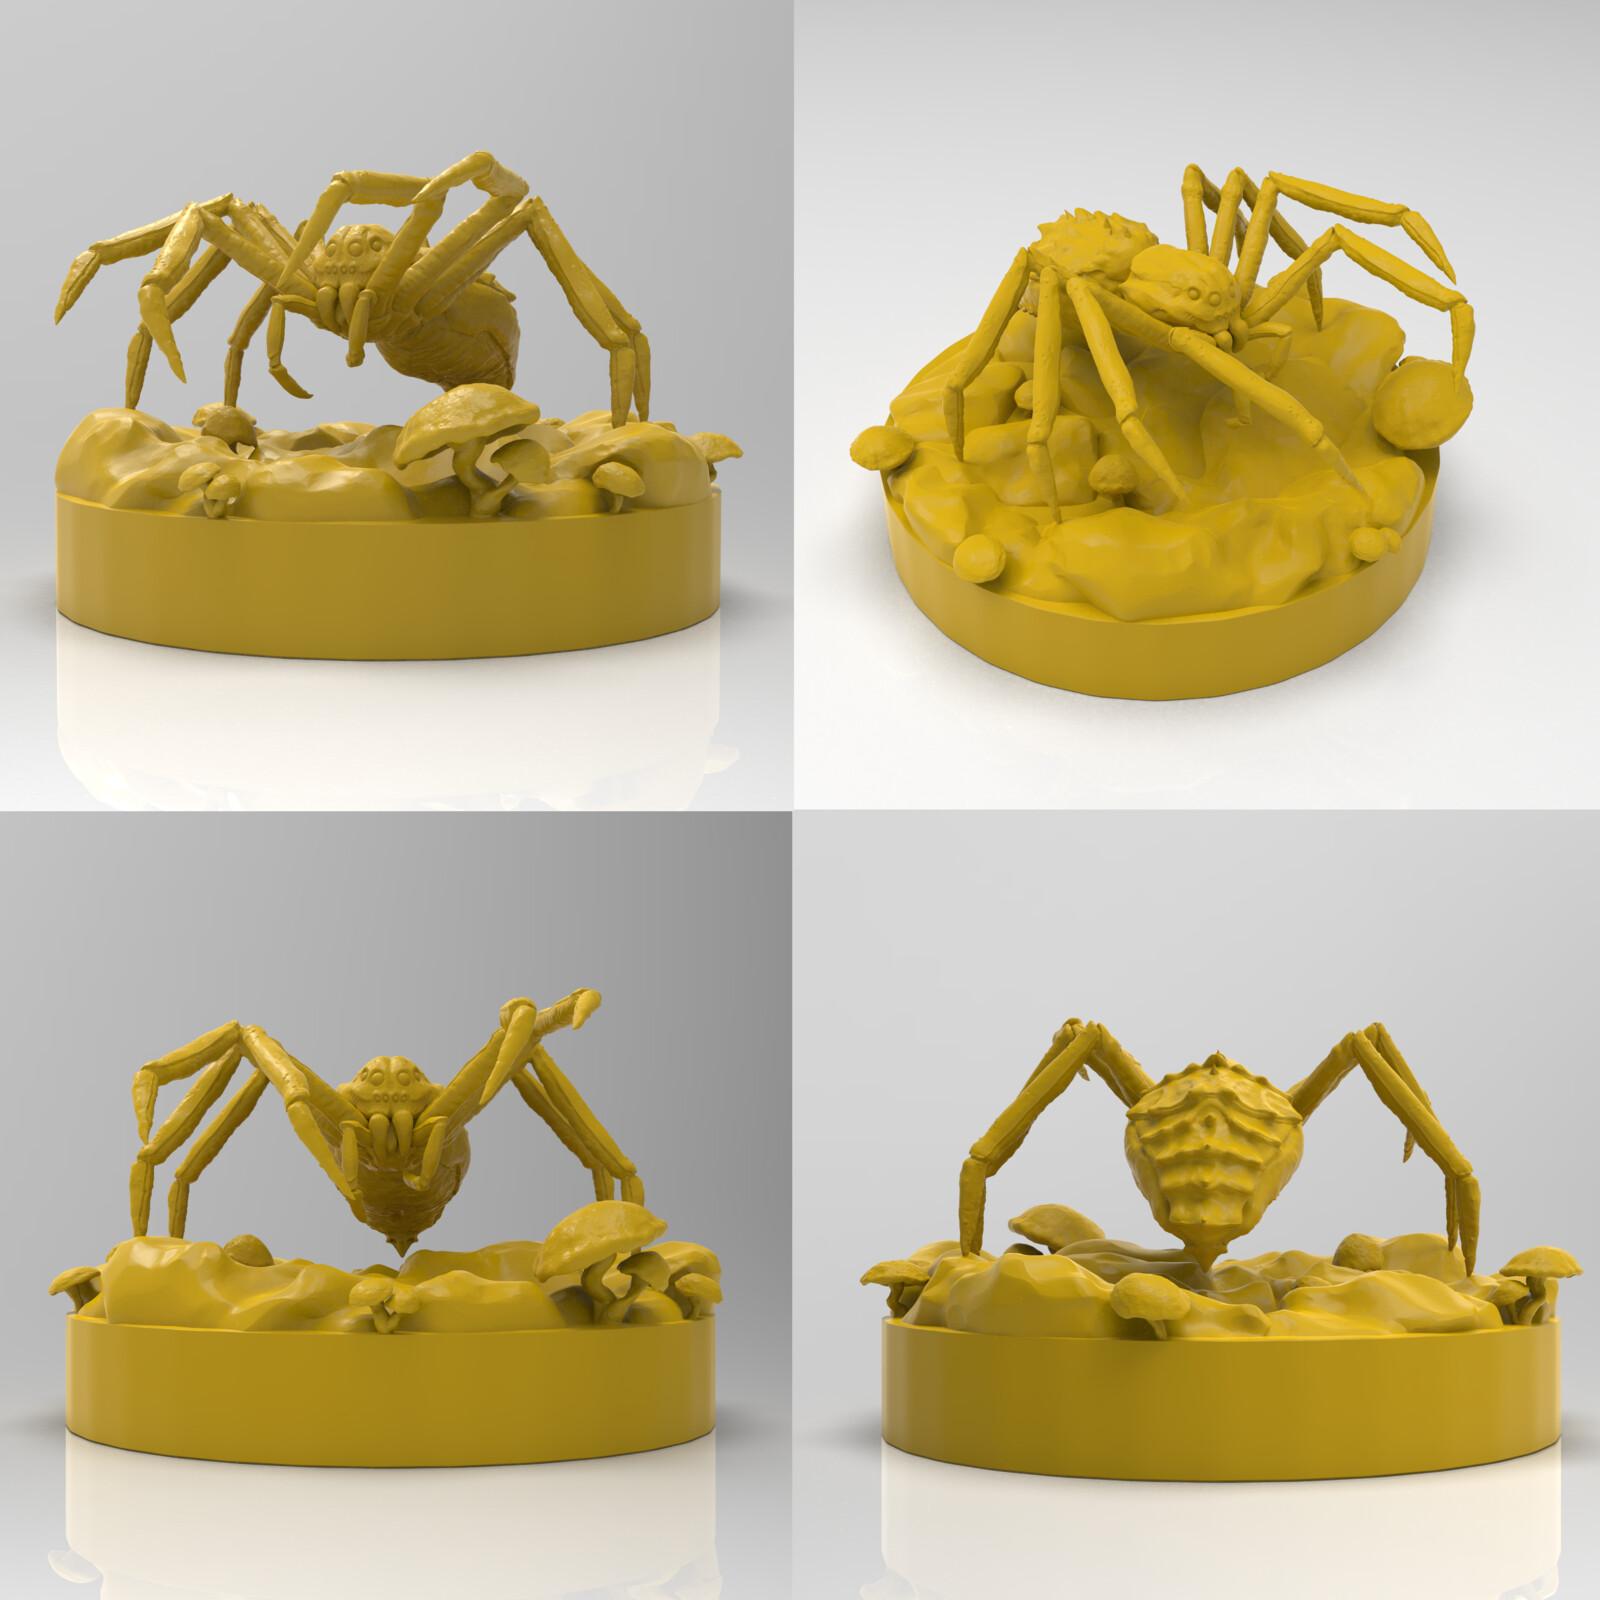 3D miniatures